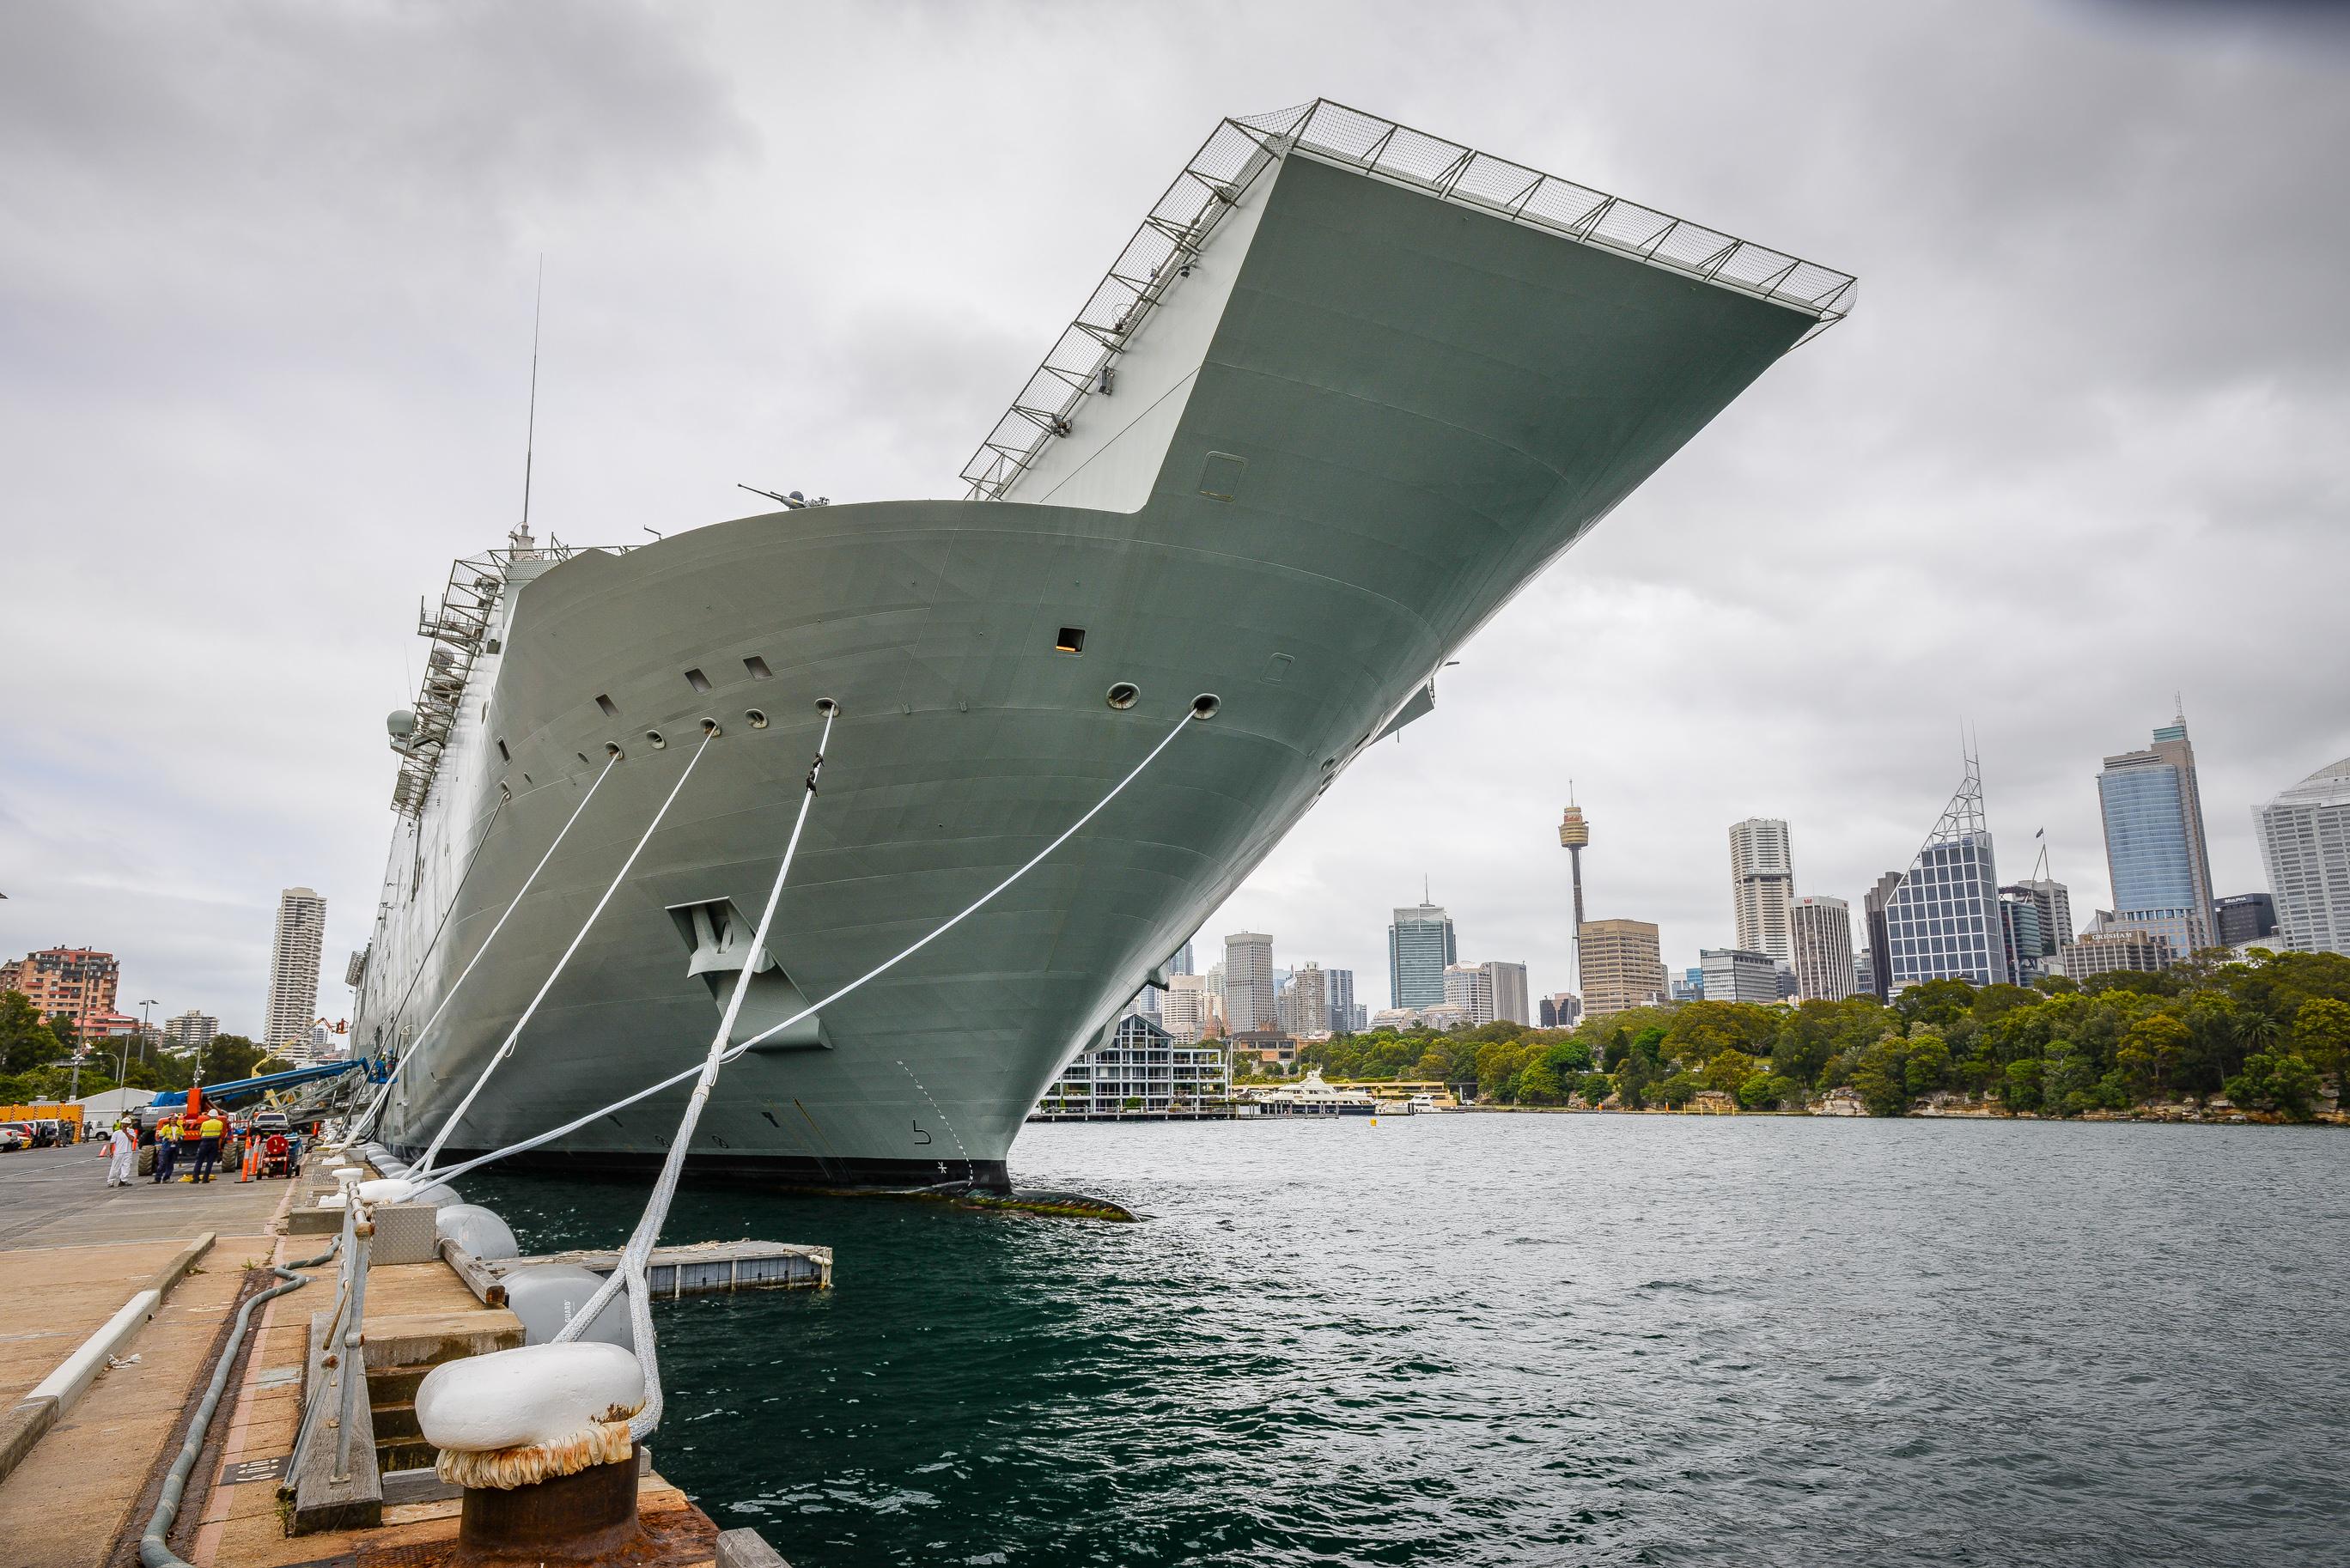 HMAS Canberra (LHD 02) berthed at Fleet Base East (8).jpg